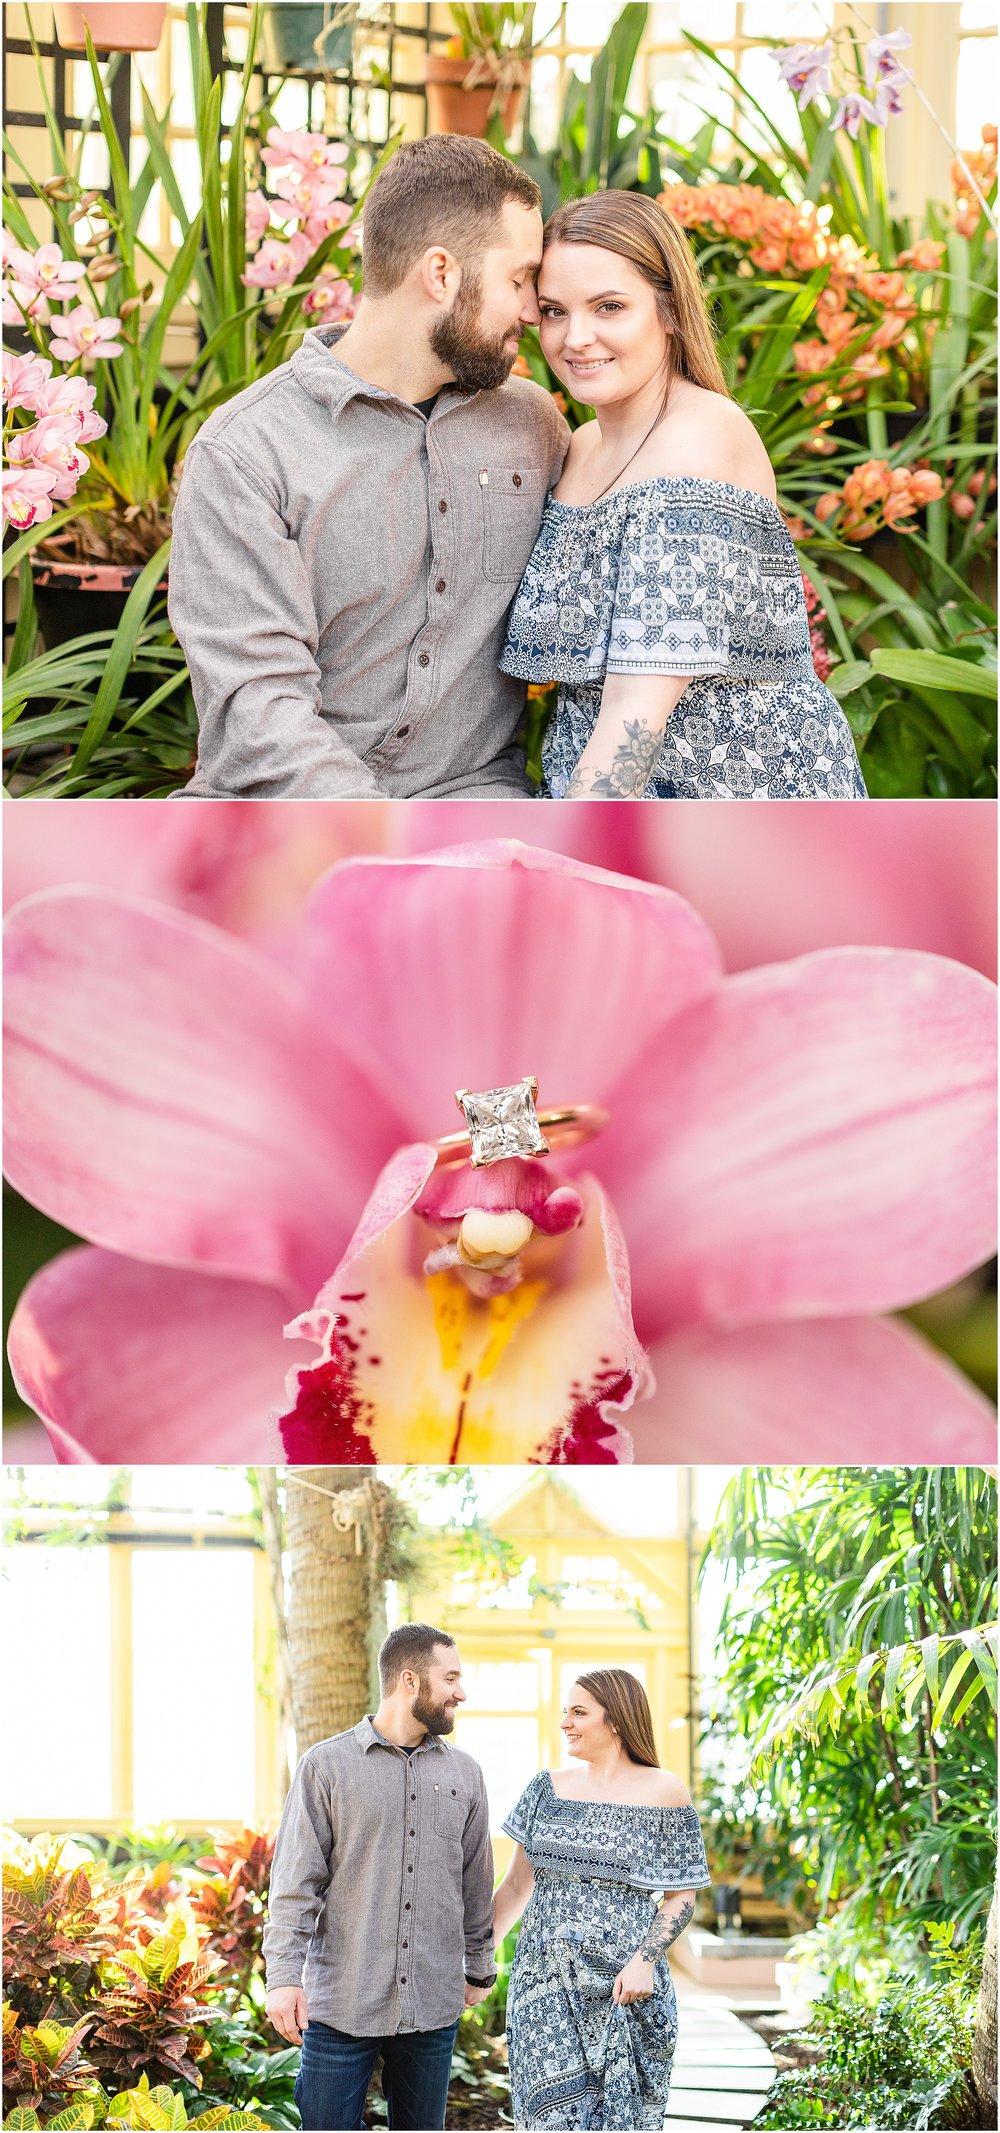 Rawlings-Conservatory-Engagement-Photos_0287.jpg